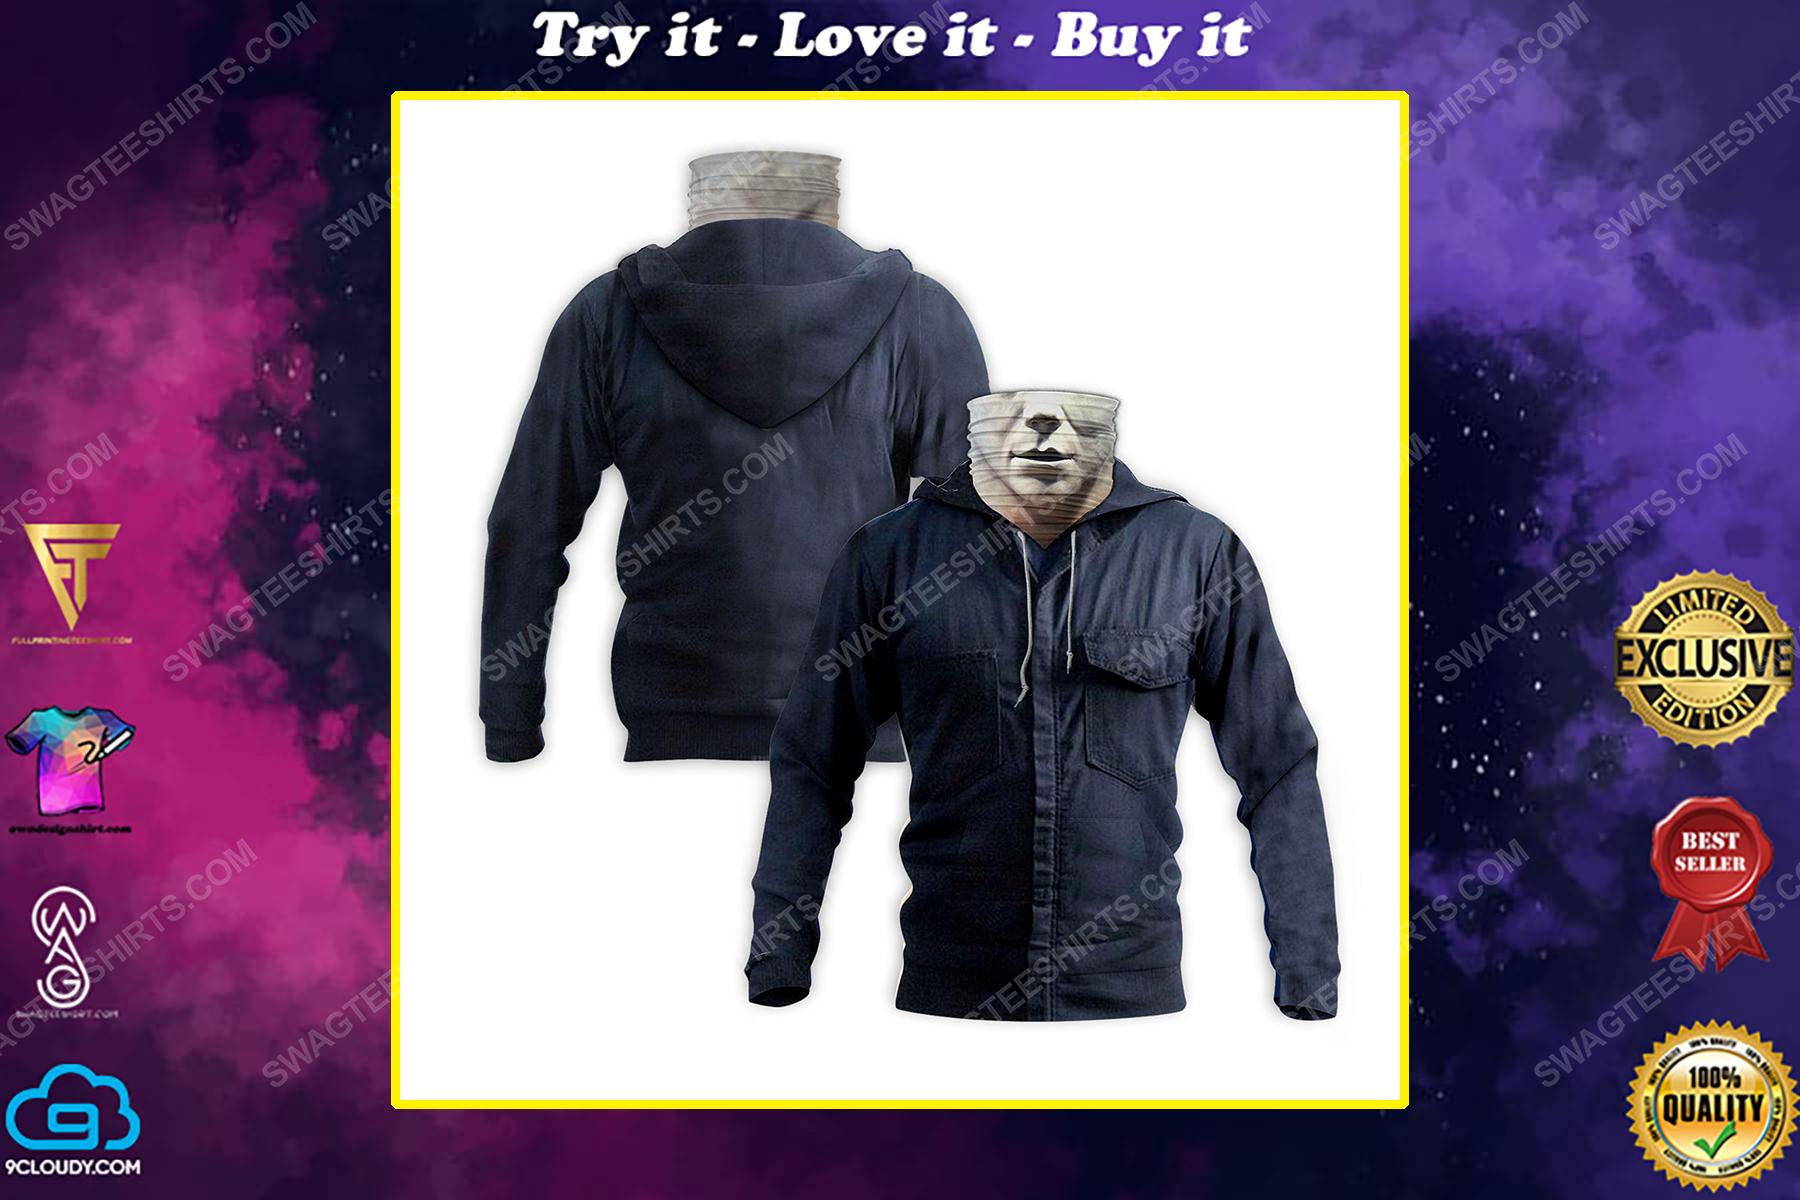 Horror movie michael myers for halloween full print mask hoodie